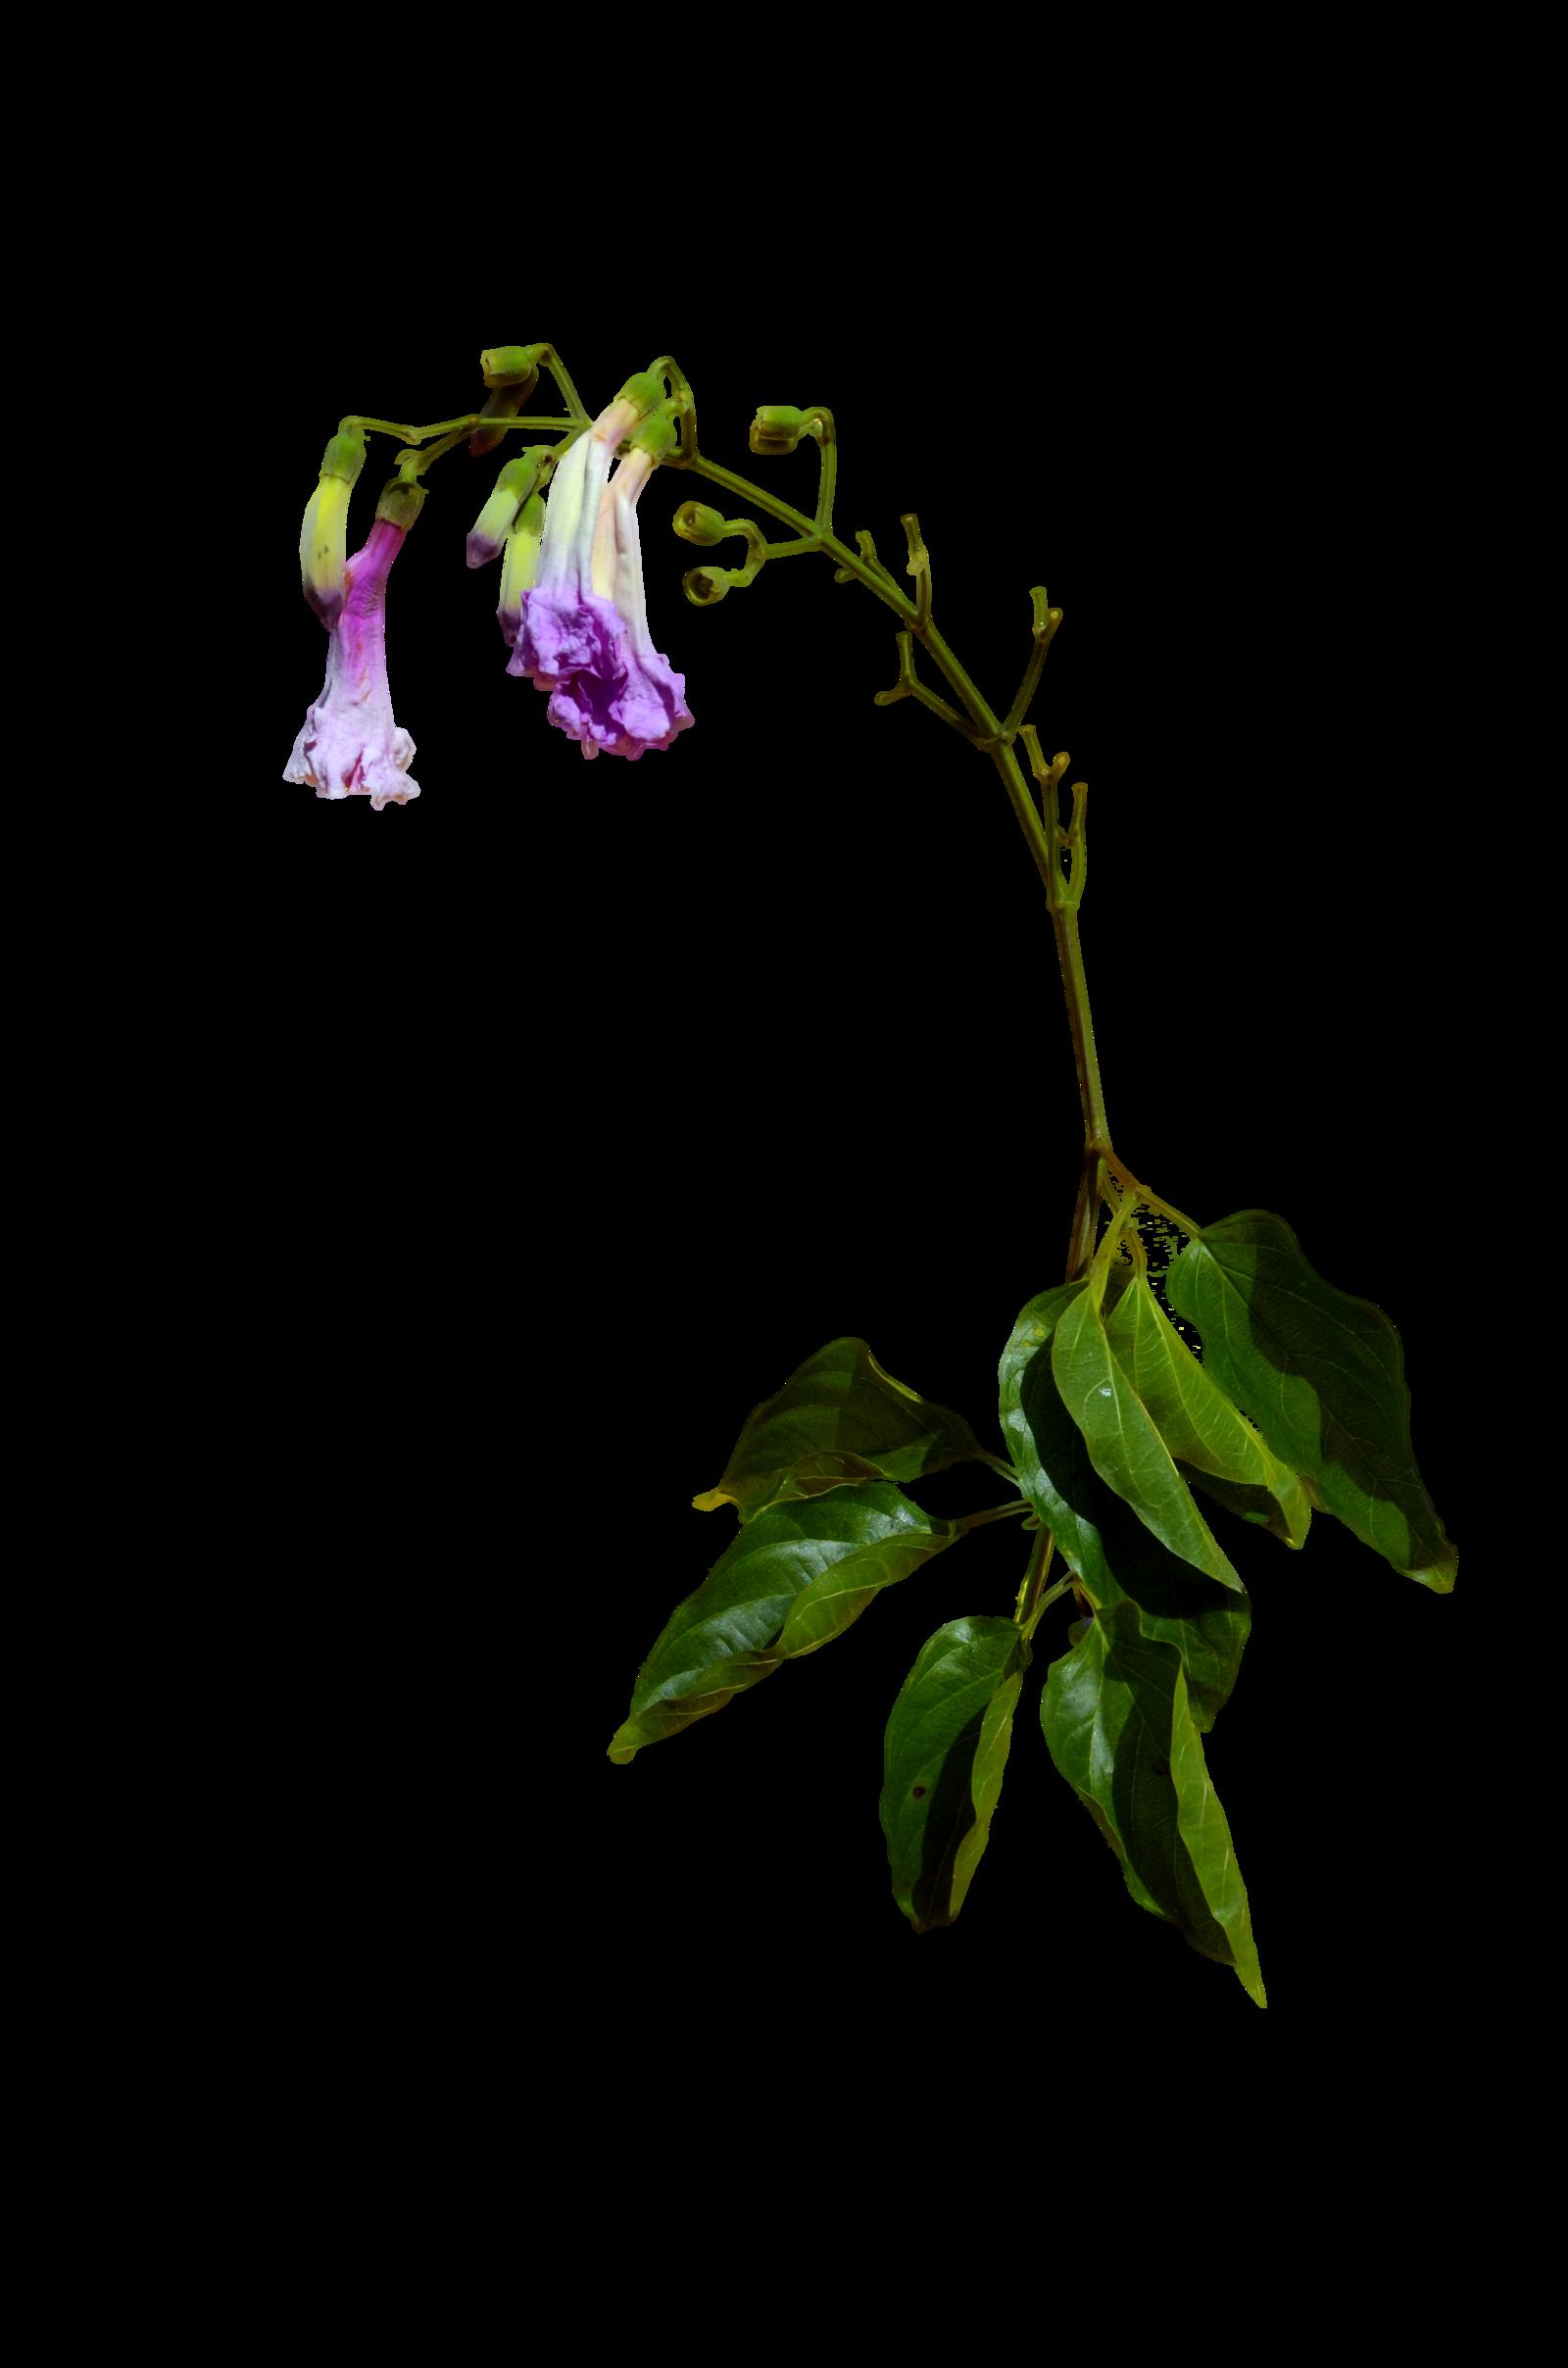 Wilted flower clipart transparent Flower Clip art - flower clipart 1600*2416 transprent Png Free ... transparent